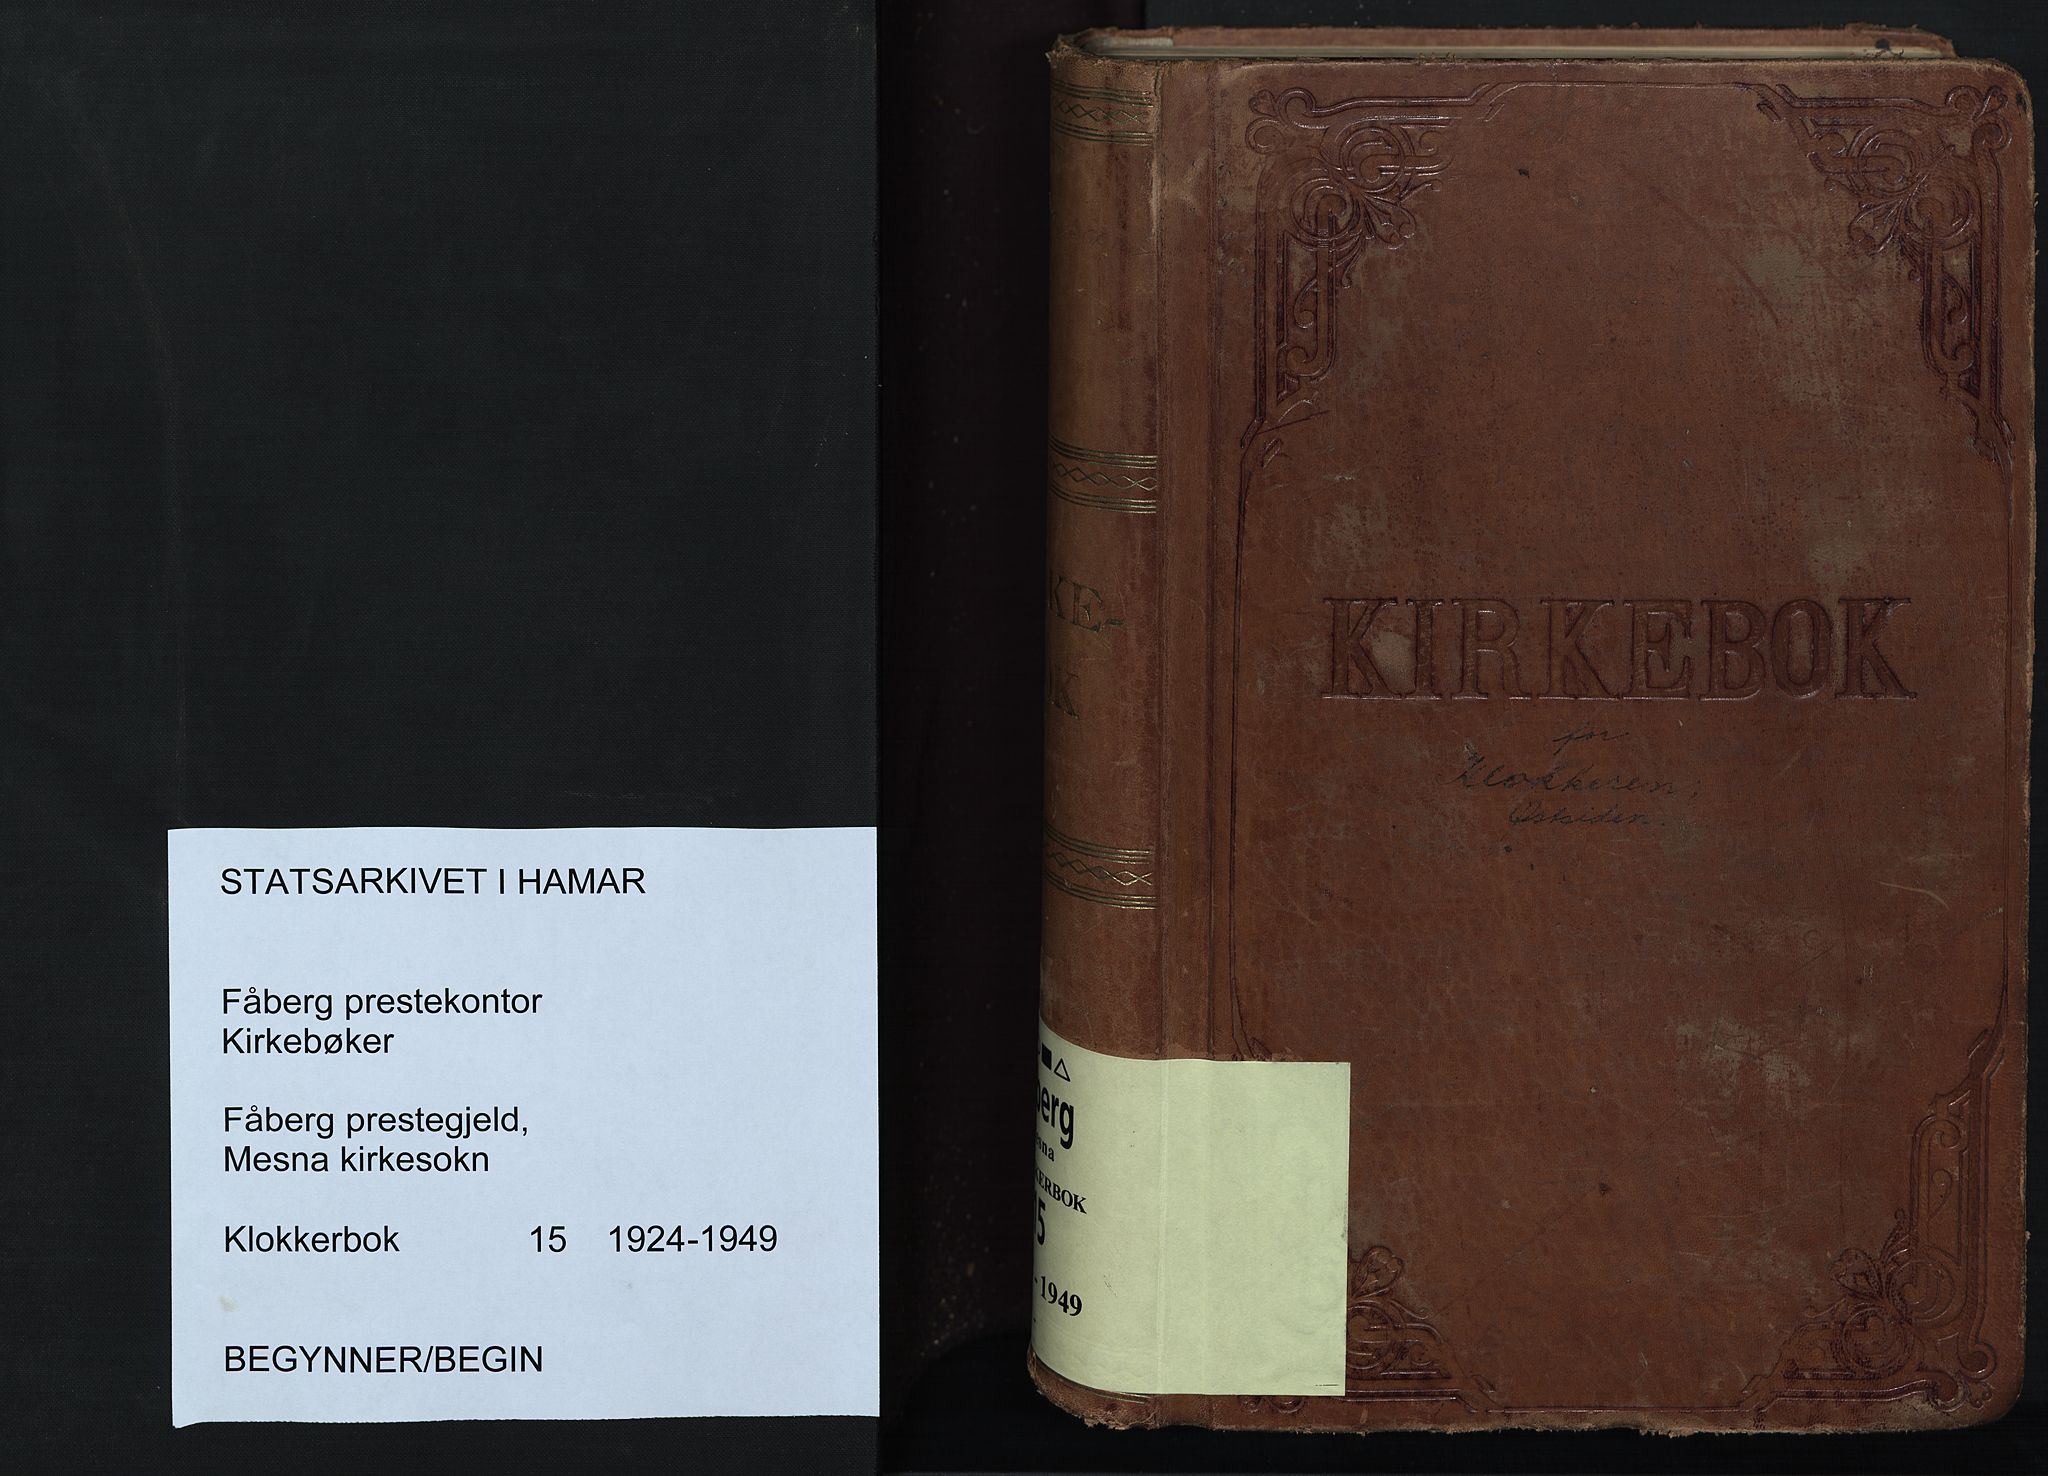 SAH, Fåberg prestekontor, Klokkerbok nr. 15, 1924-1949